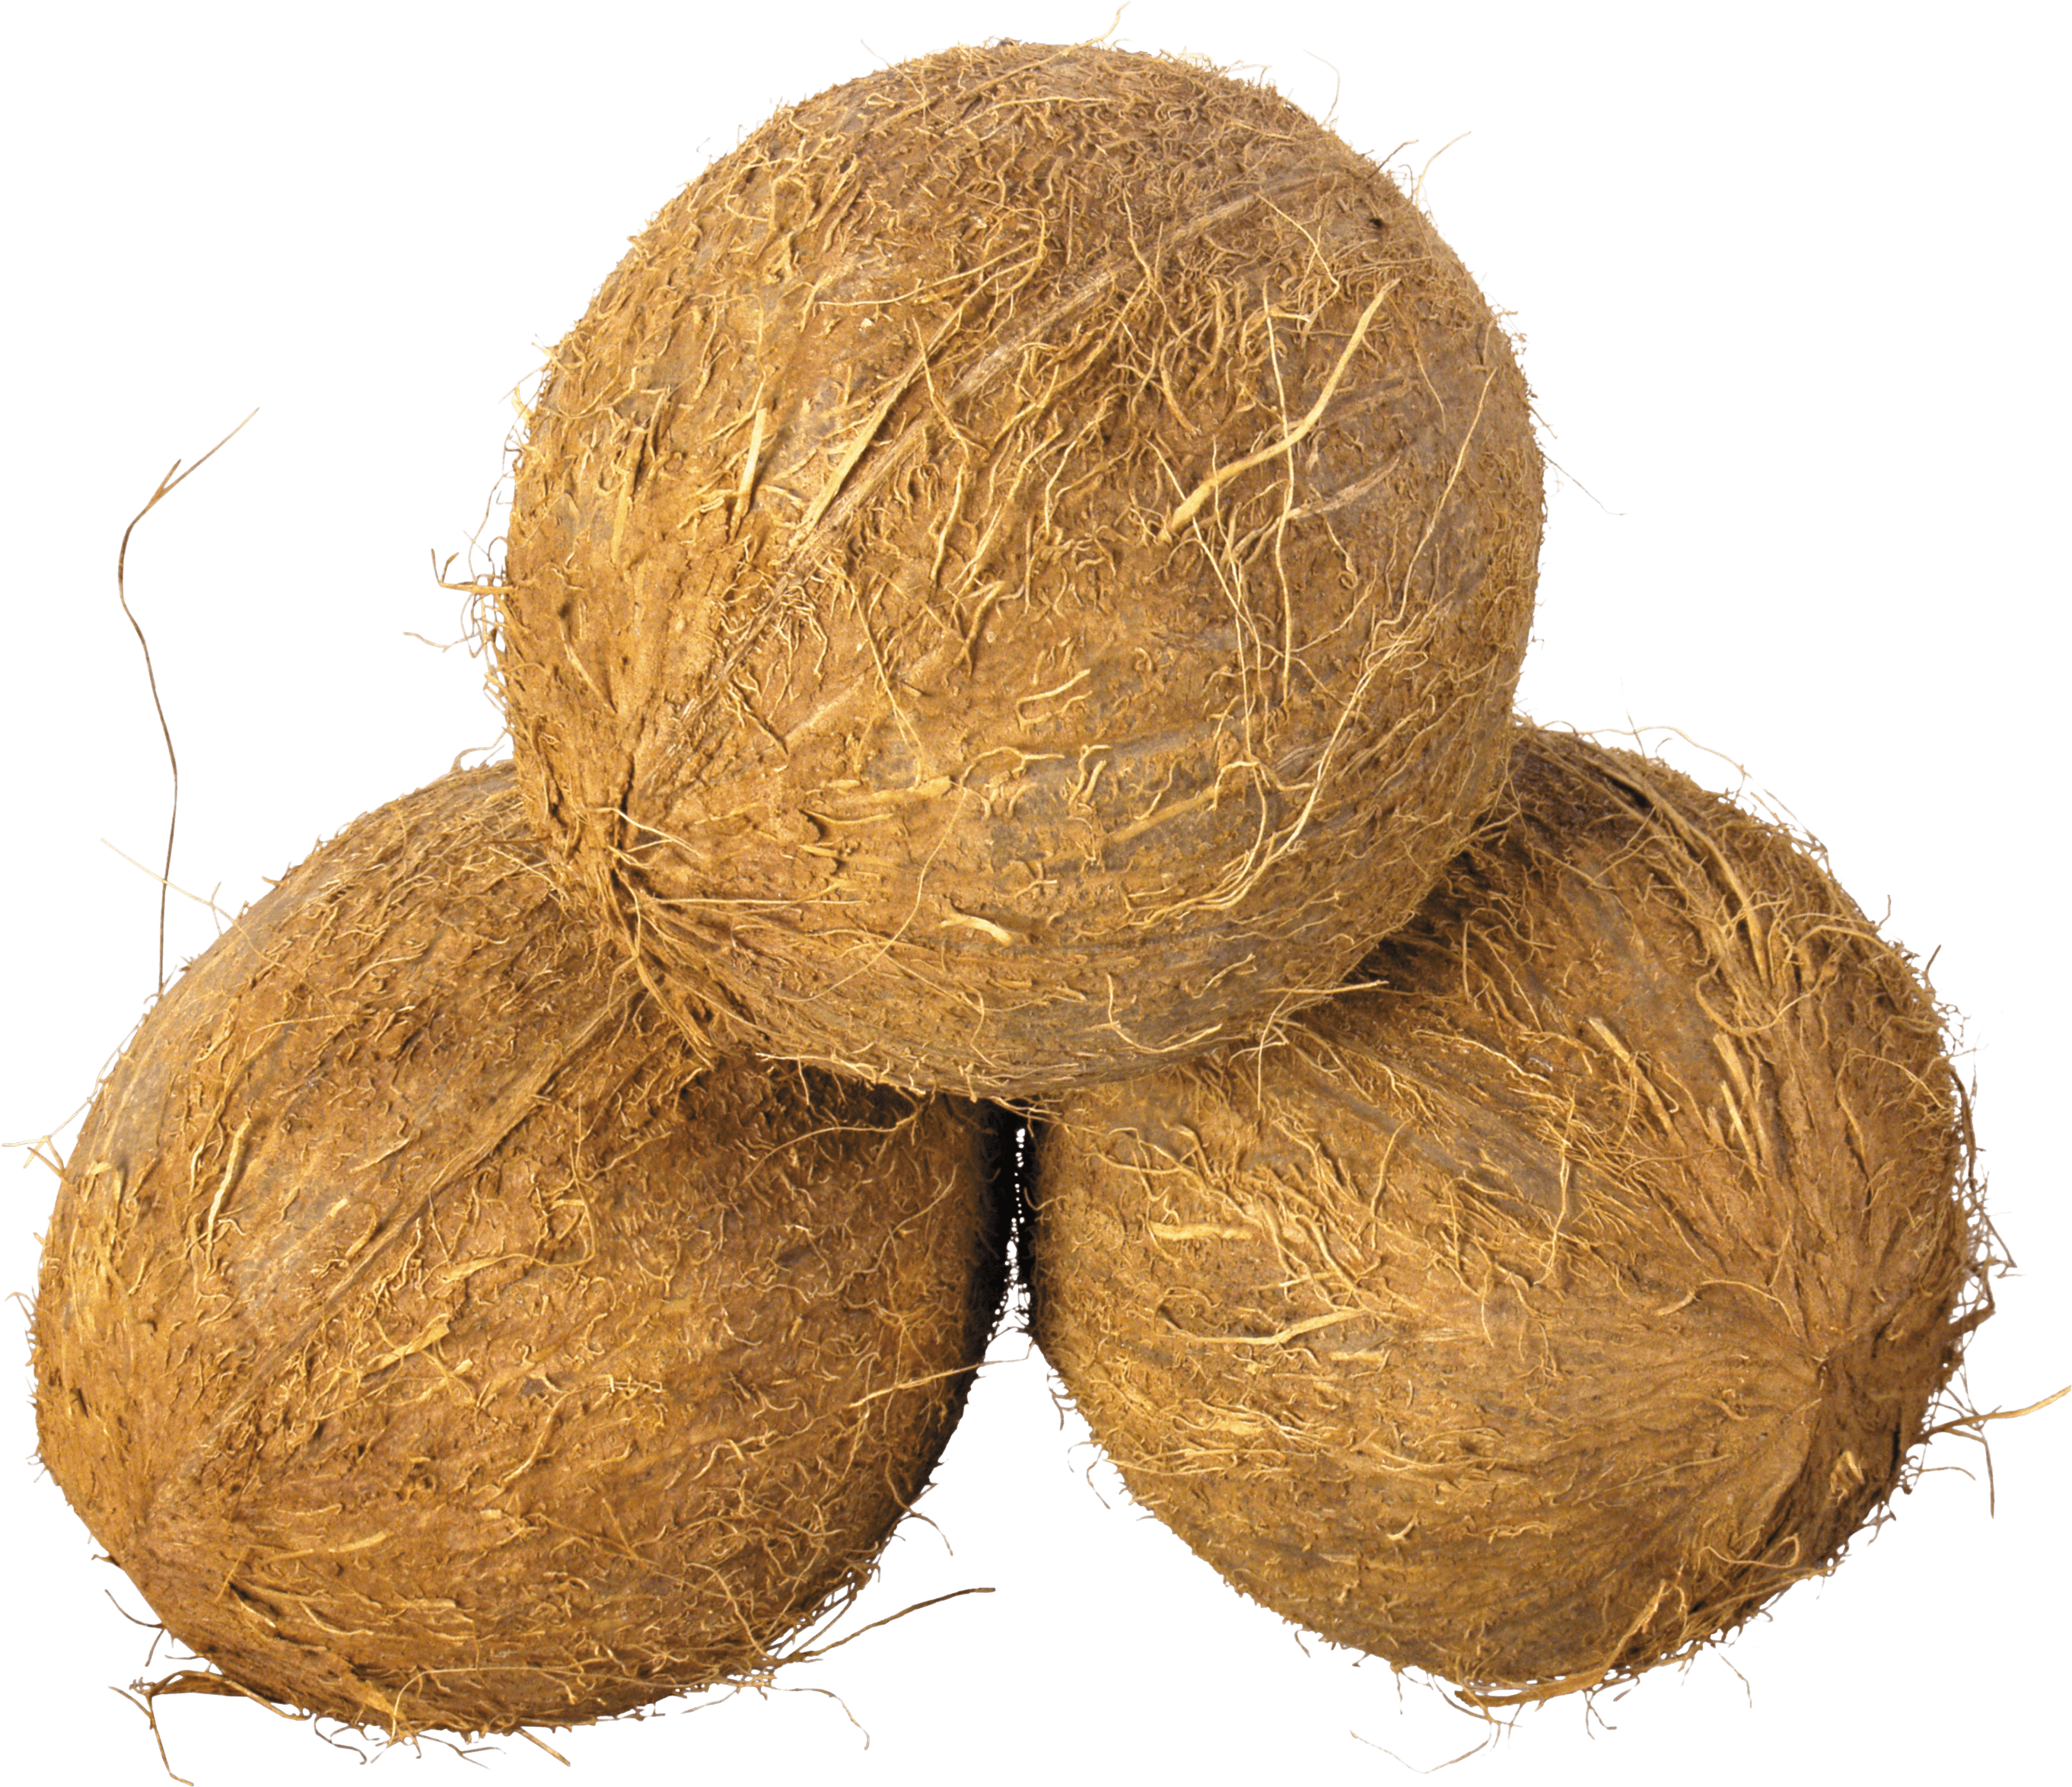 Coconut clipart tumblr transparent. Trio png stickpng